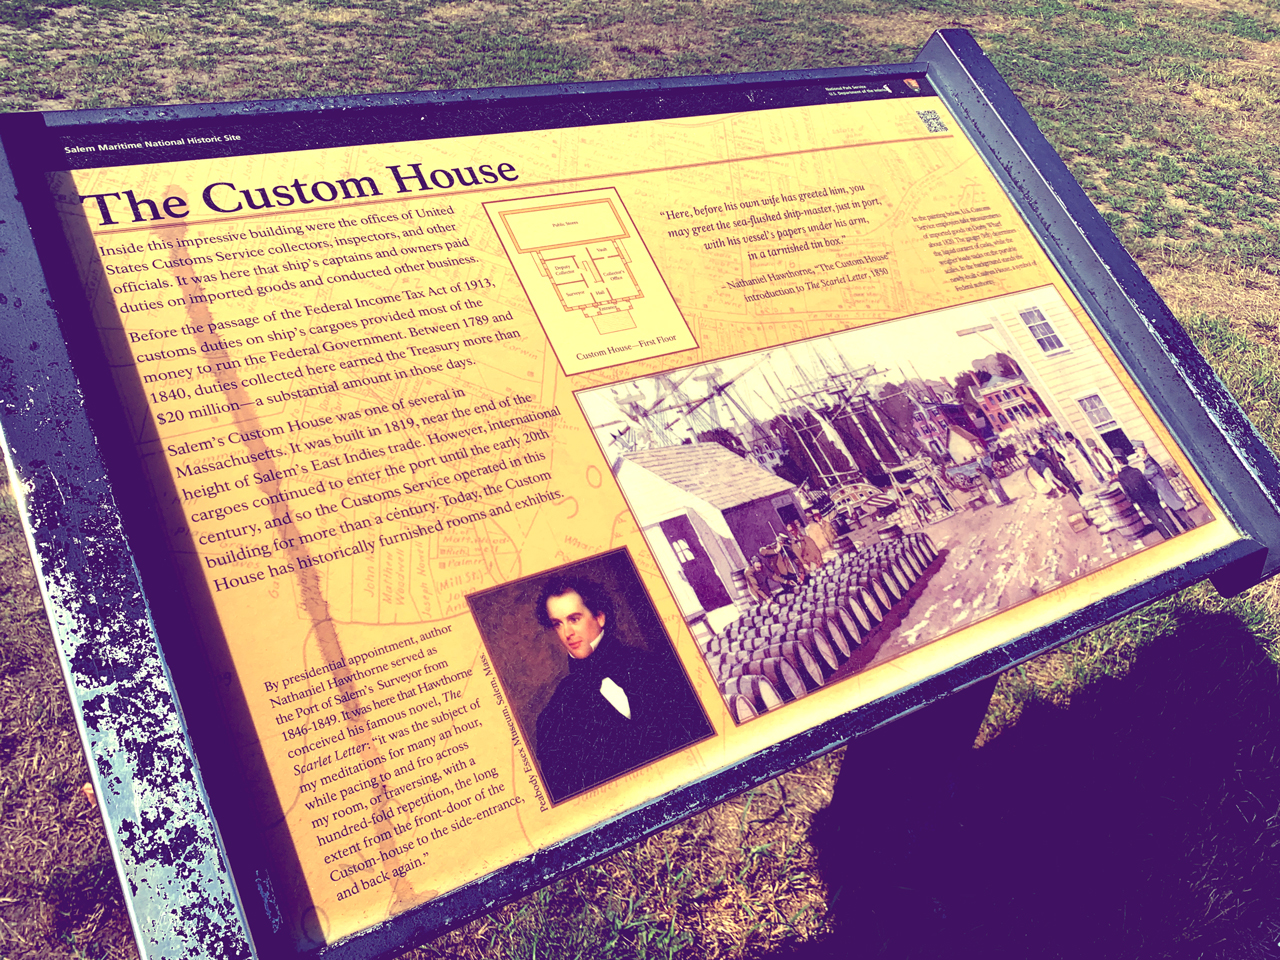 custom-house-salem-massachusetts-1280x960